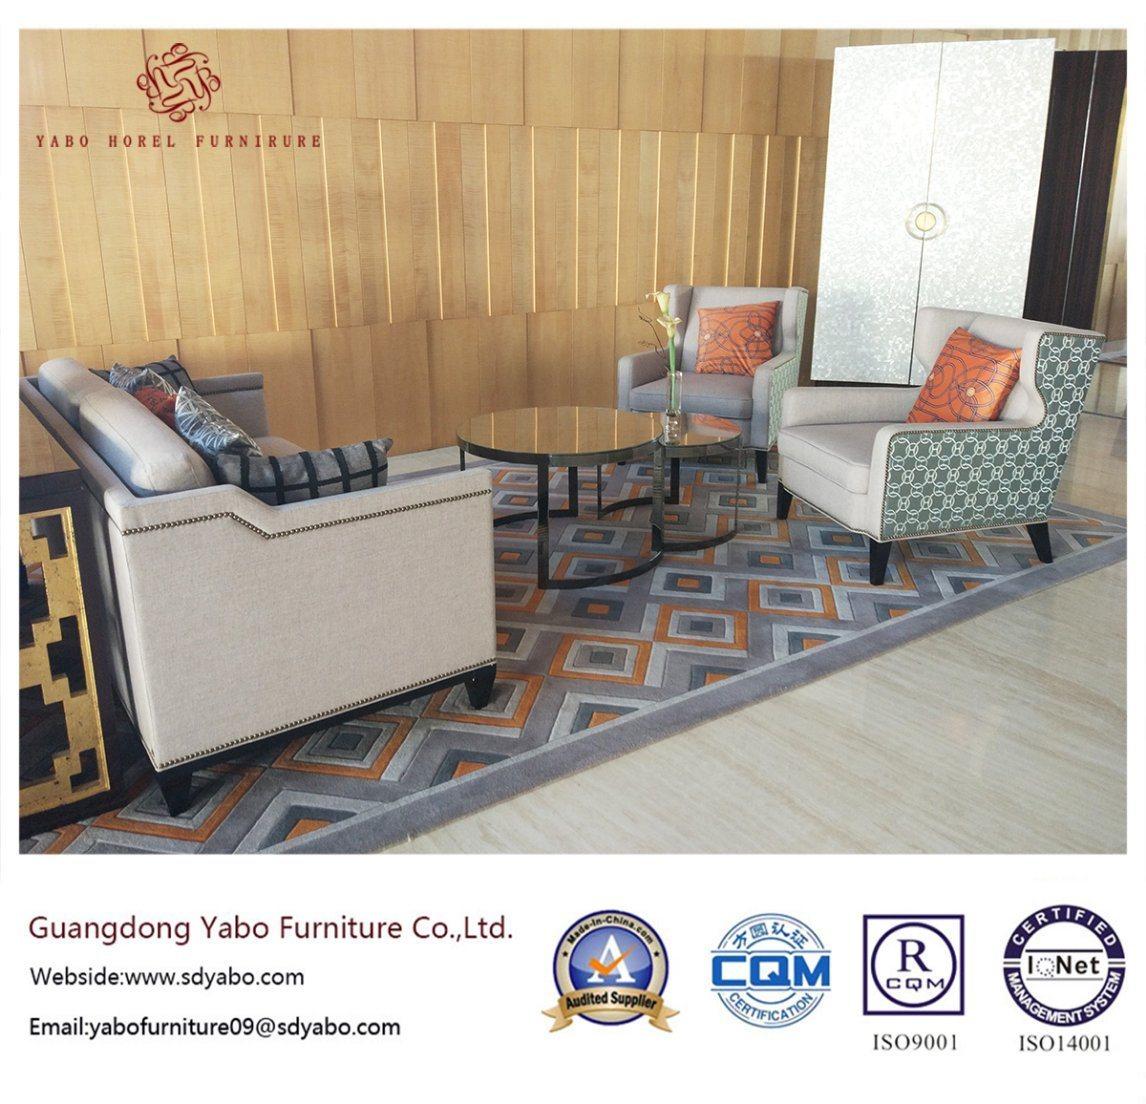 Wooden Hotel Furniture with Lobby Fabric Sofa Set (YB-O-43)